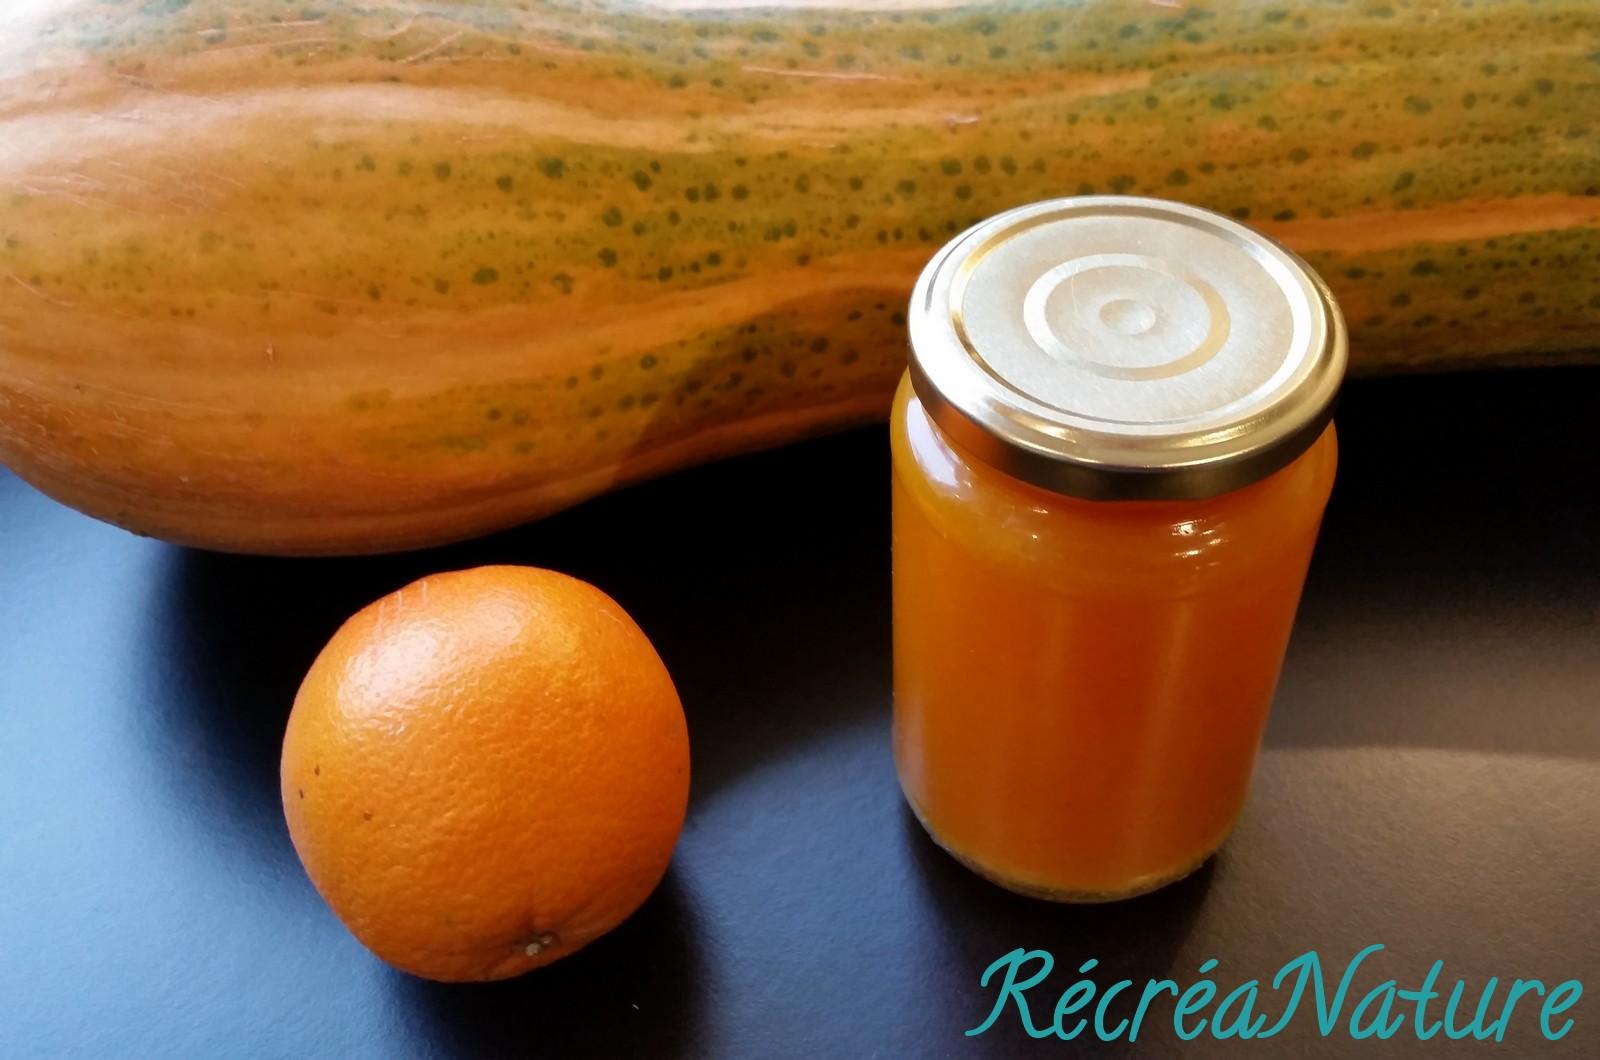 Gel e de courge de nice du jardin aux zestes d 39 orange bio - Courge de nice ...